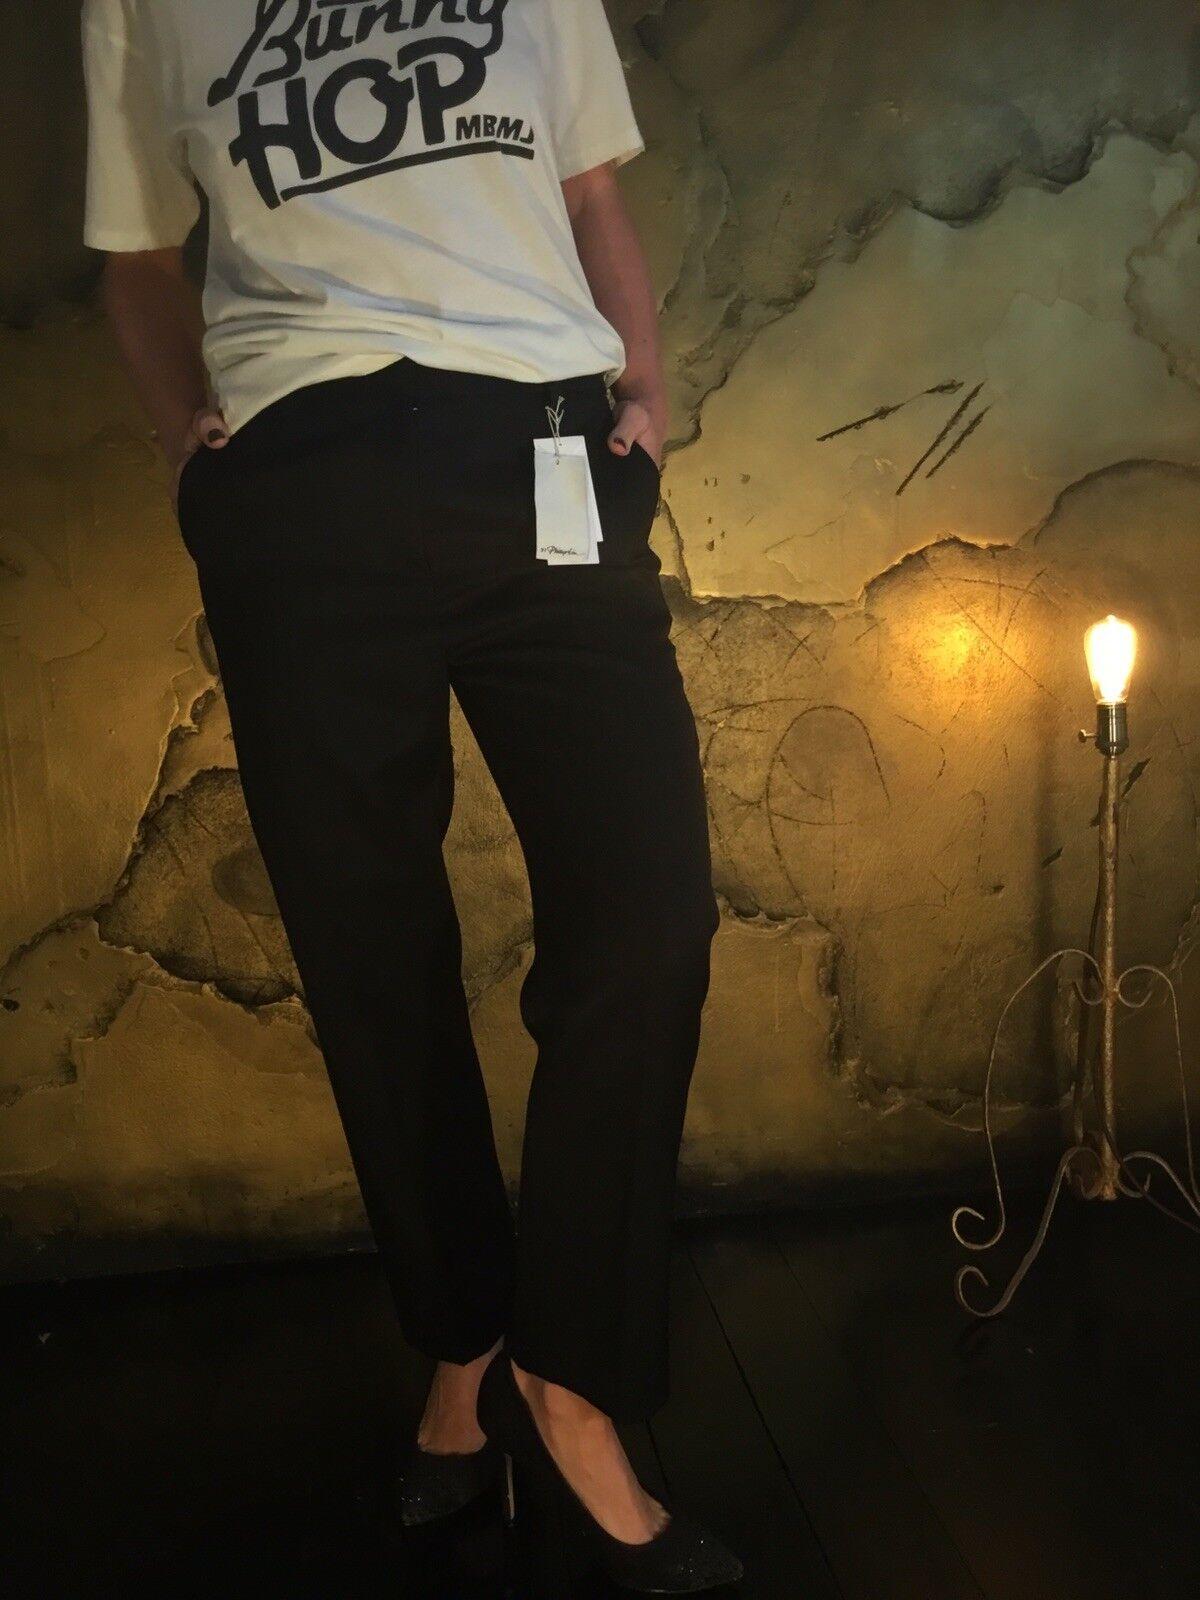 BNWT 3.1 PHILLIP LIM Women's Trousers Size US8, RRP